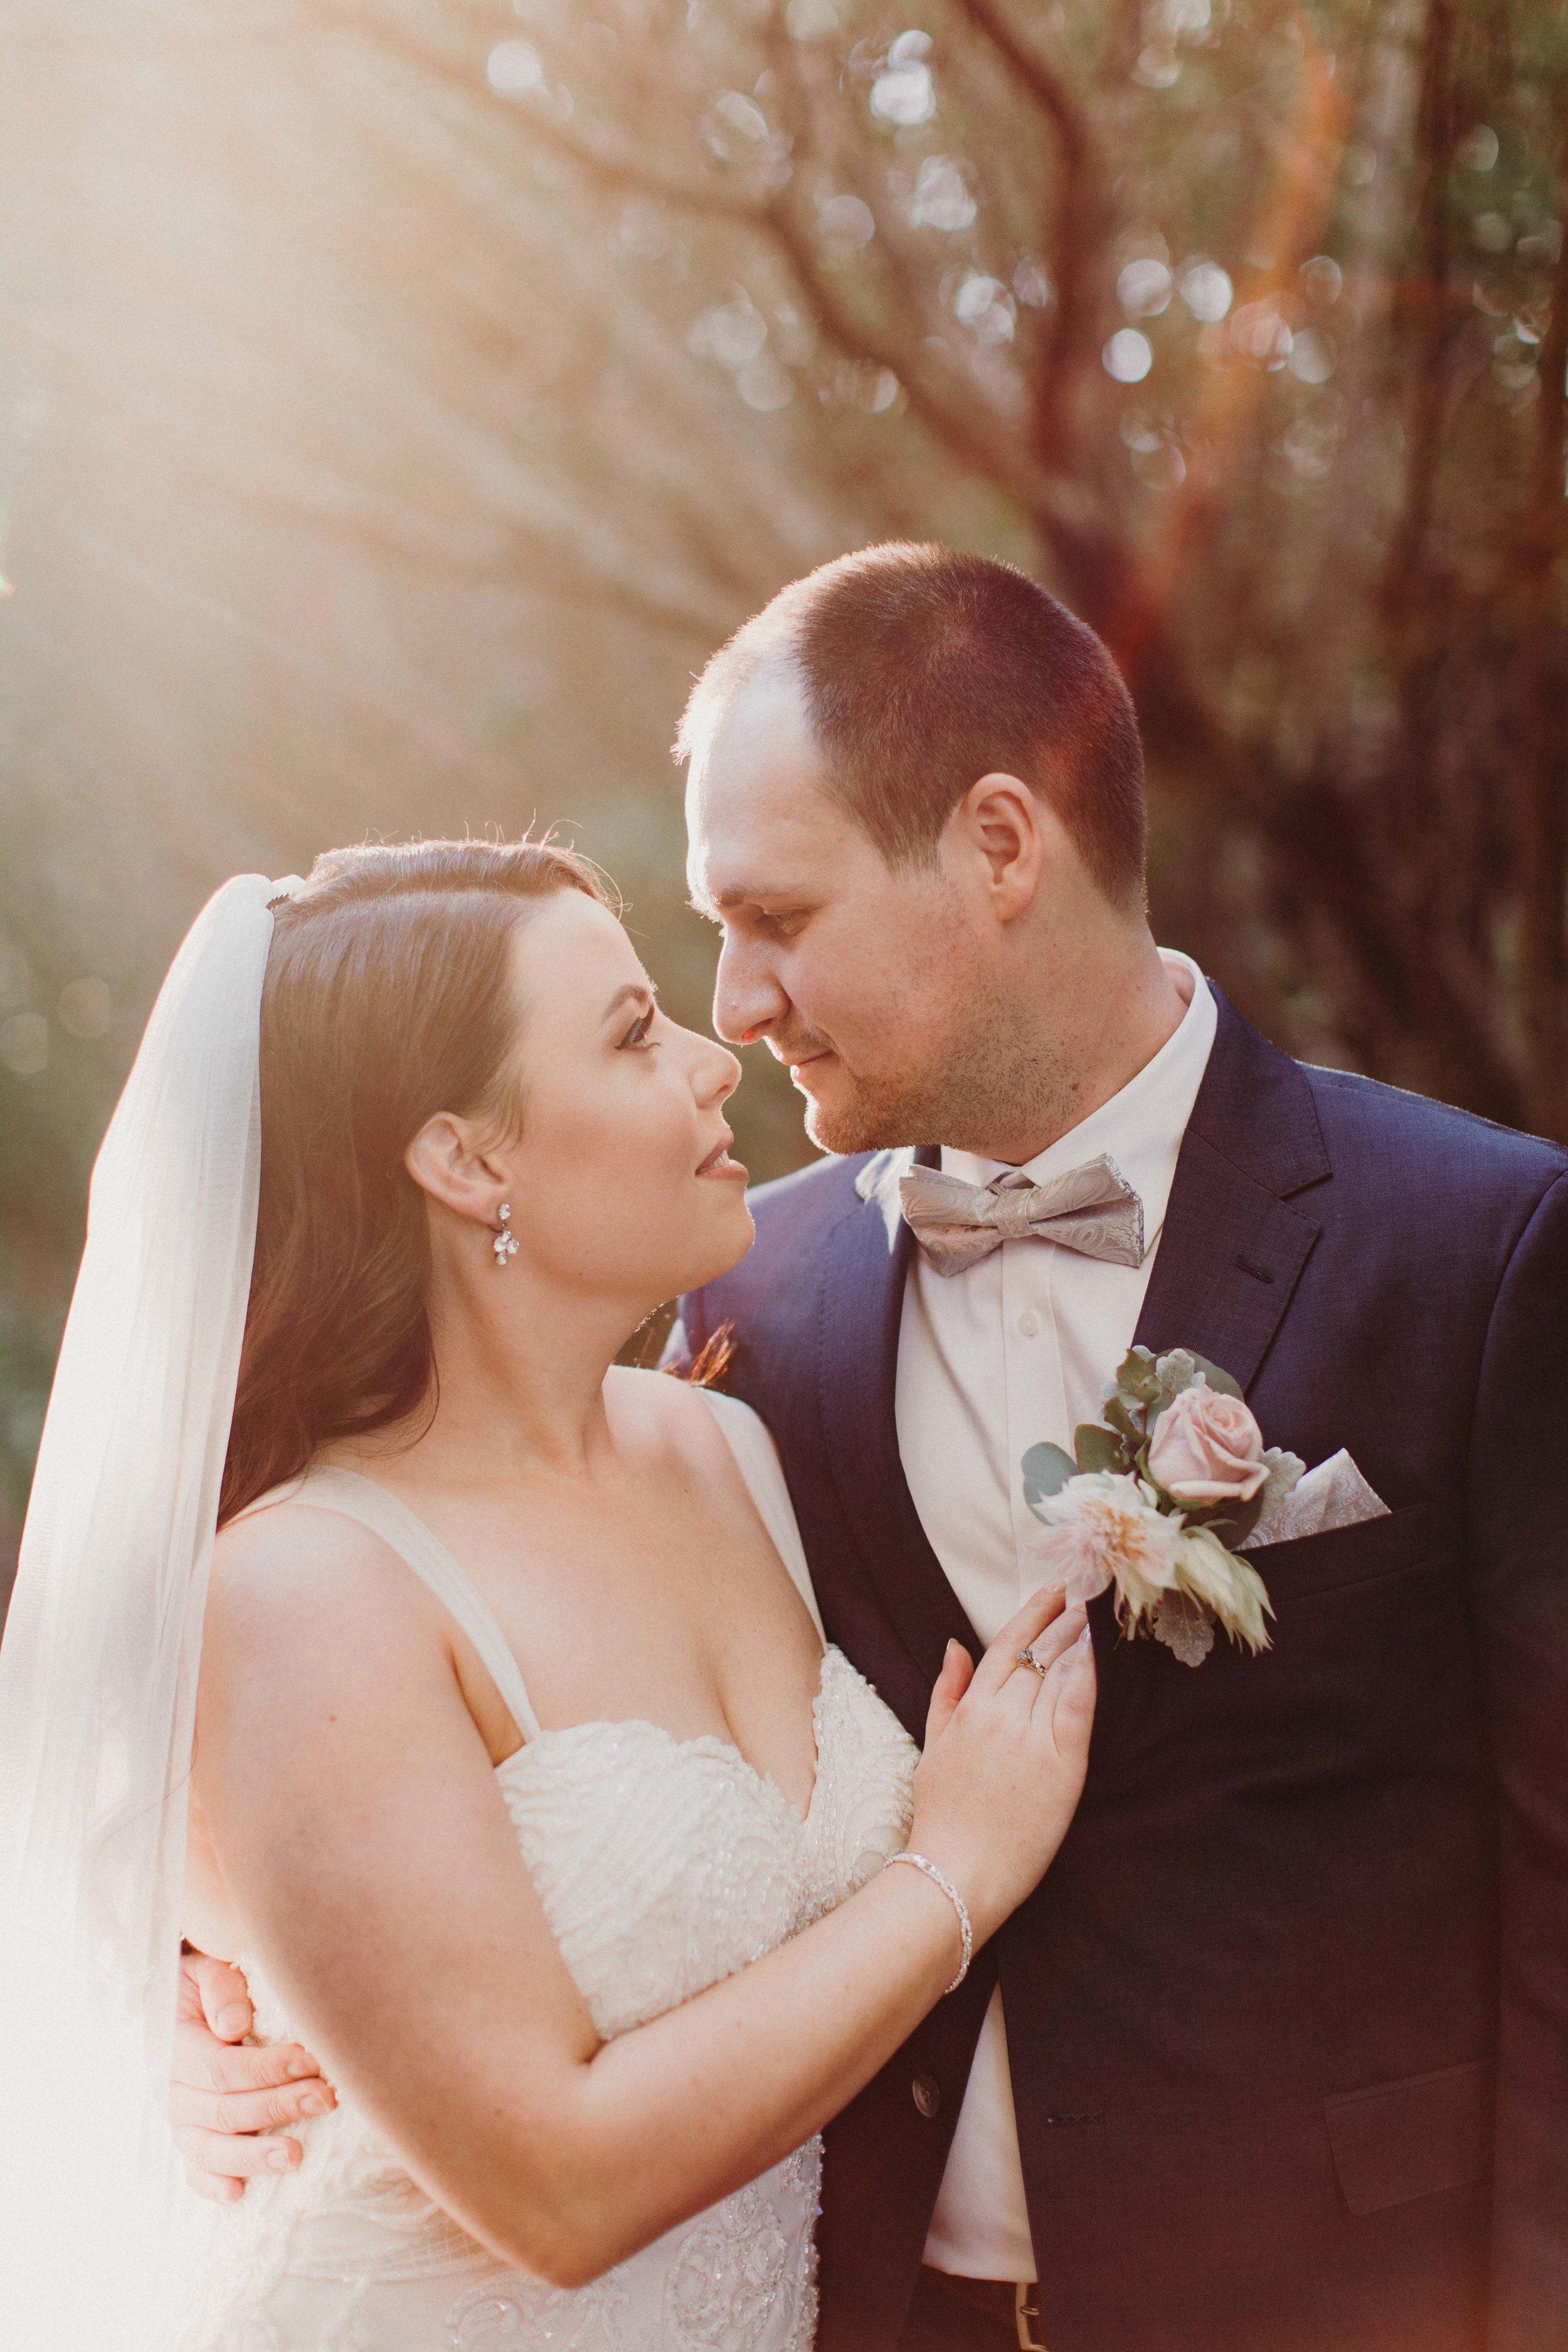 exeter-southern-highlands-wedding-www.emilyobrienphotography.net -110.jpg